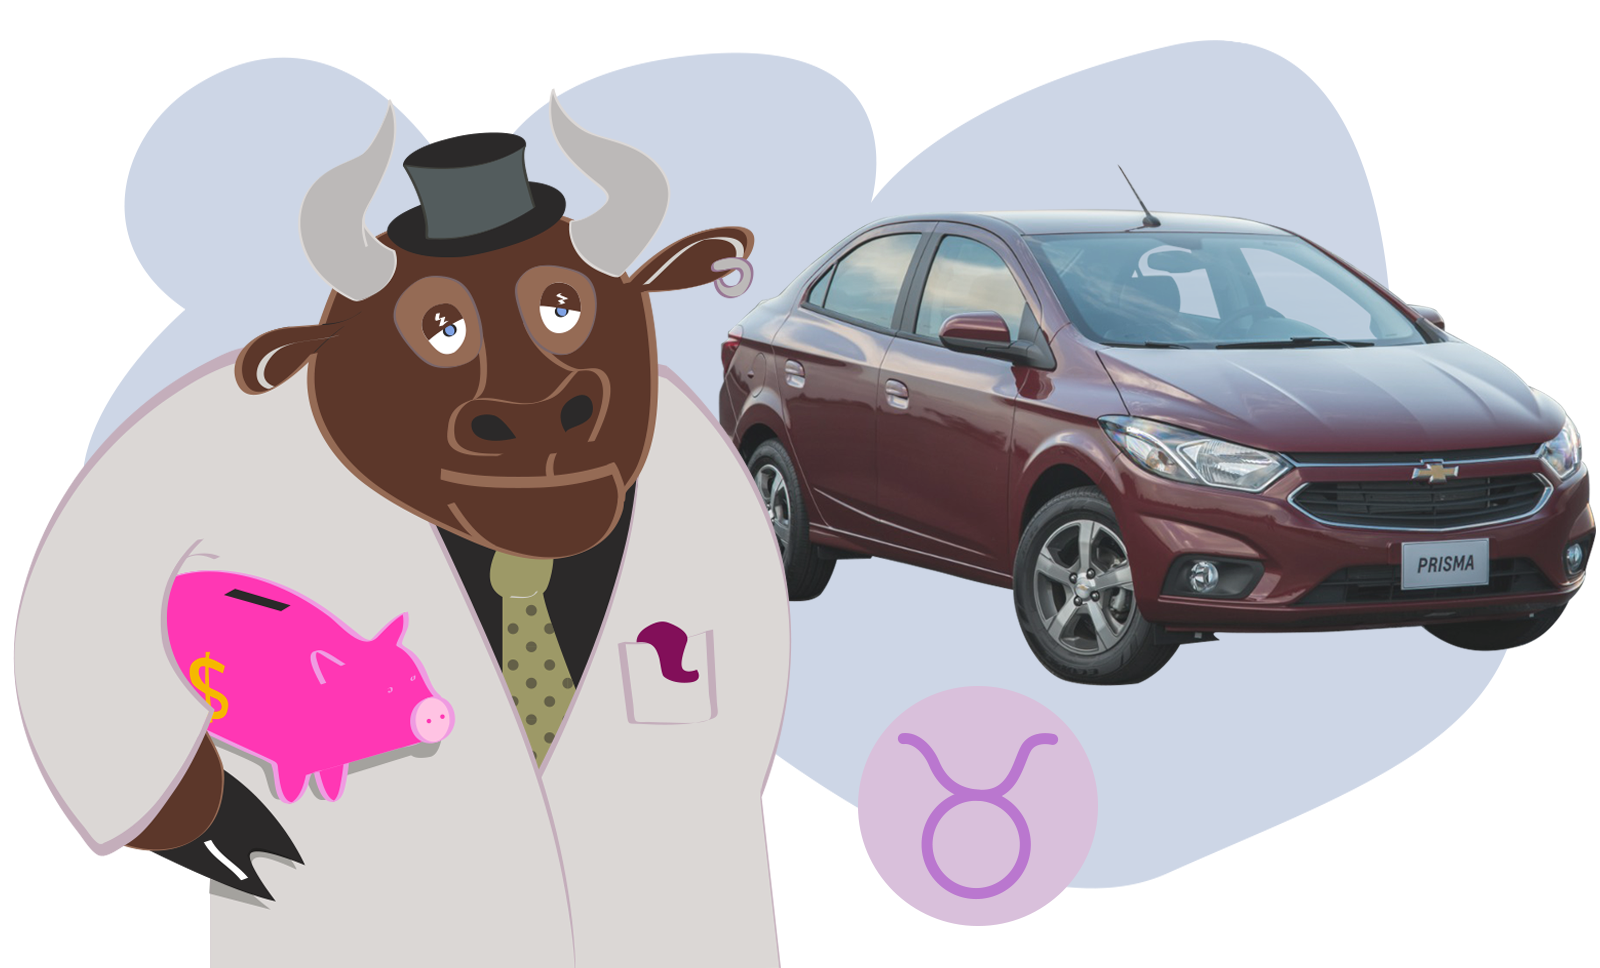 Carro de cada signo: Prisma para touro